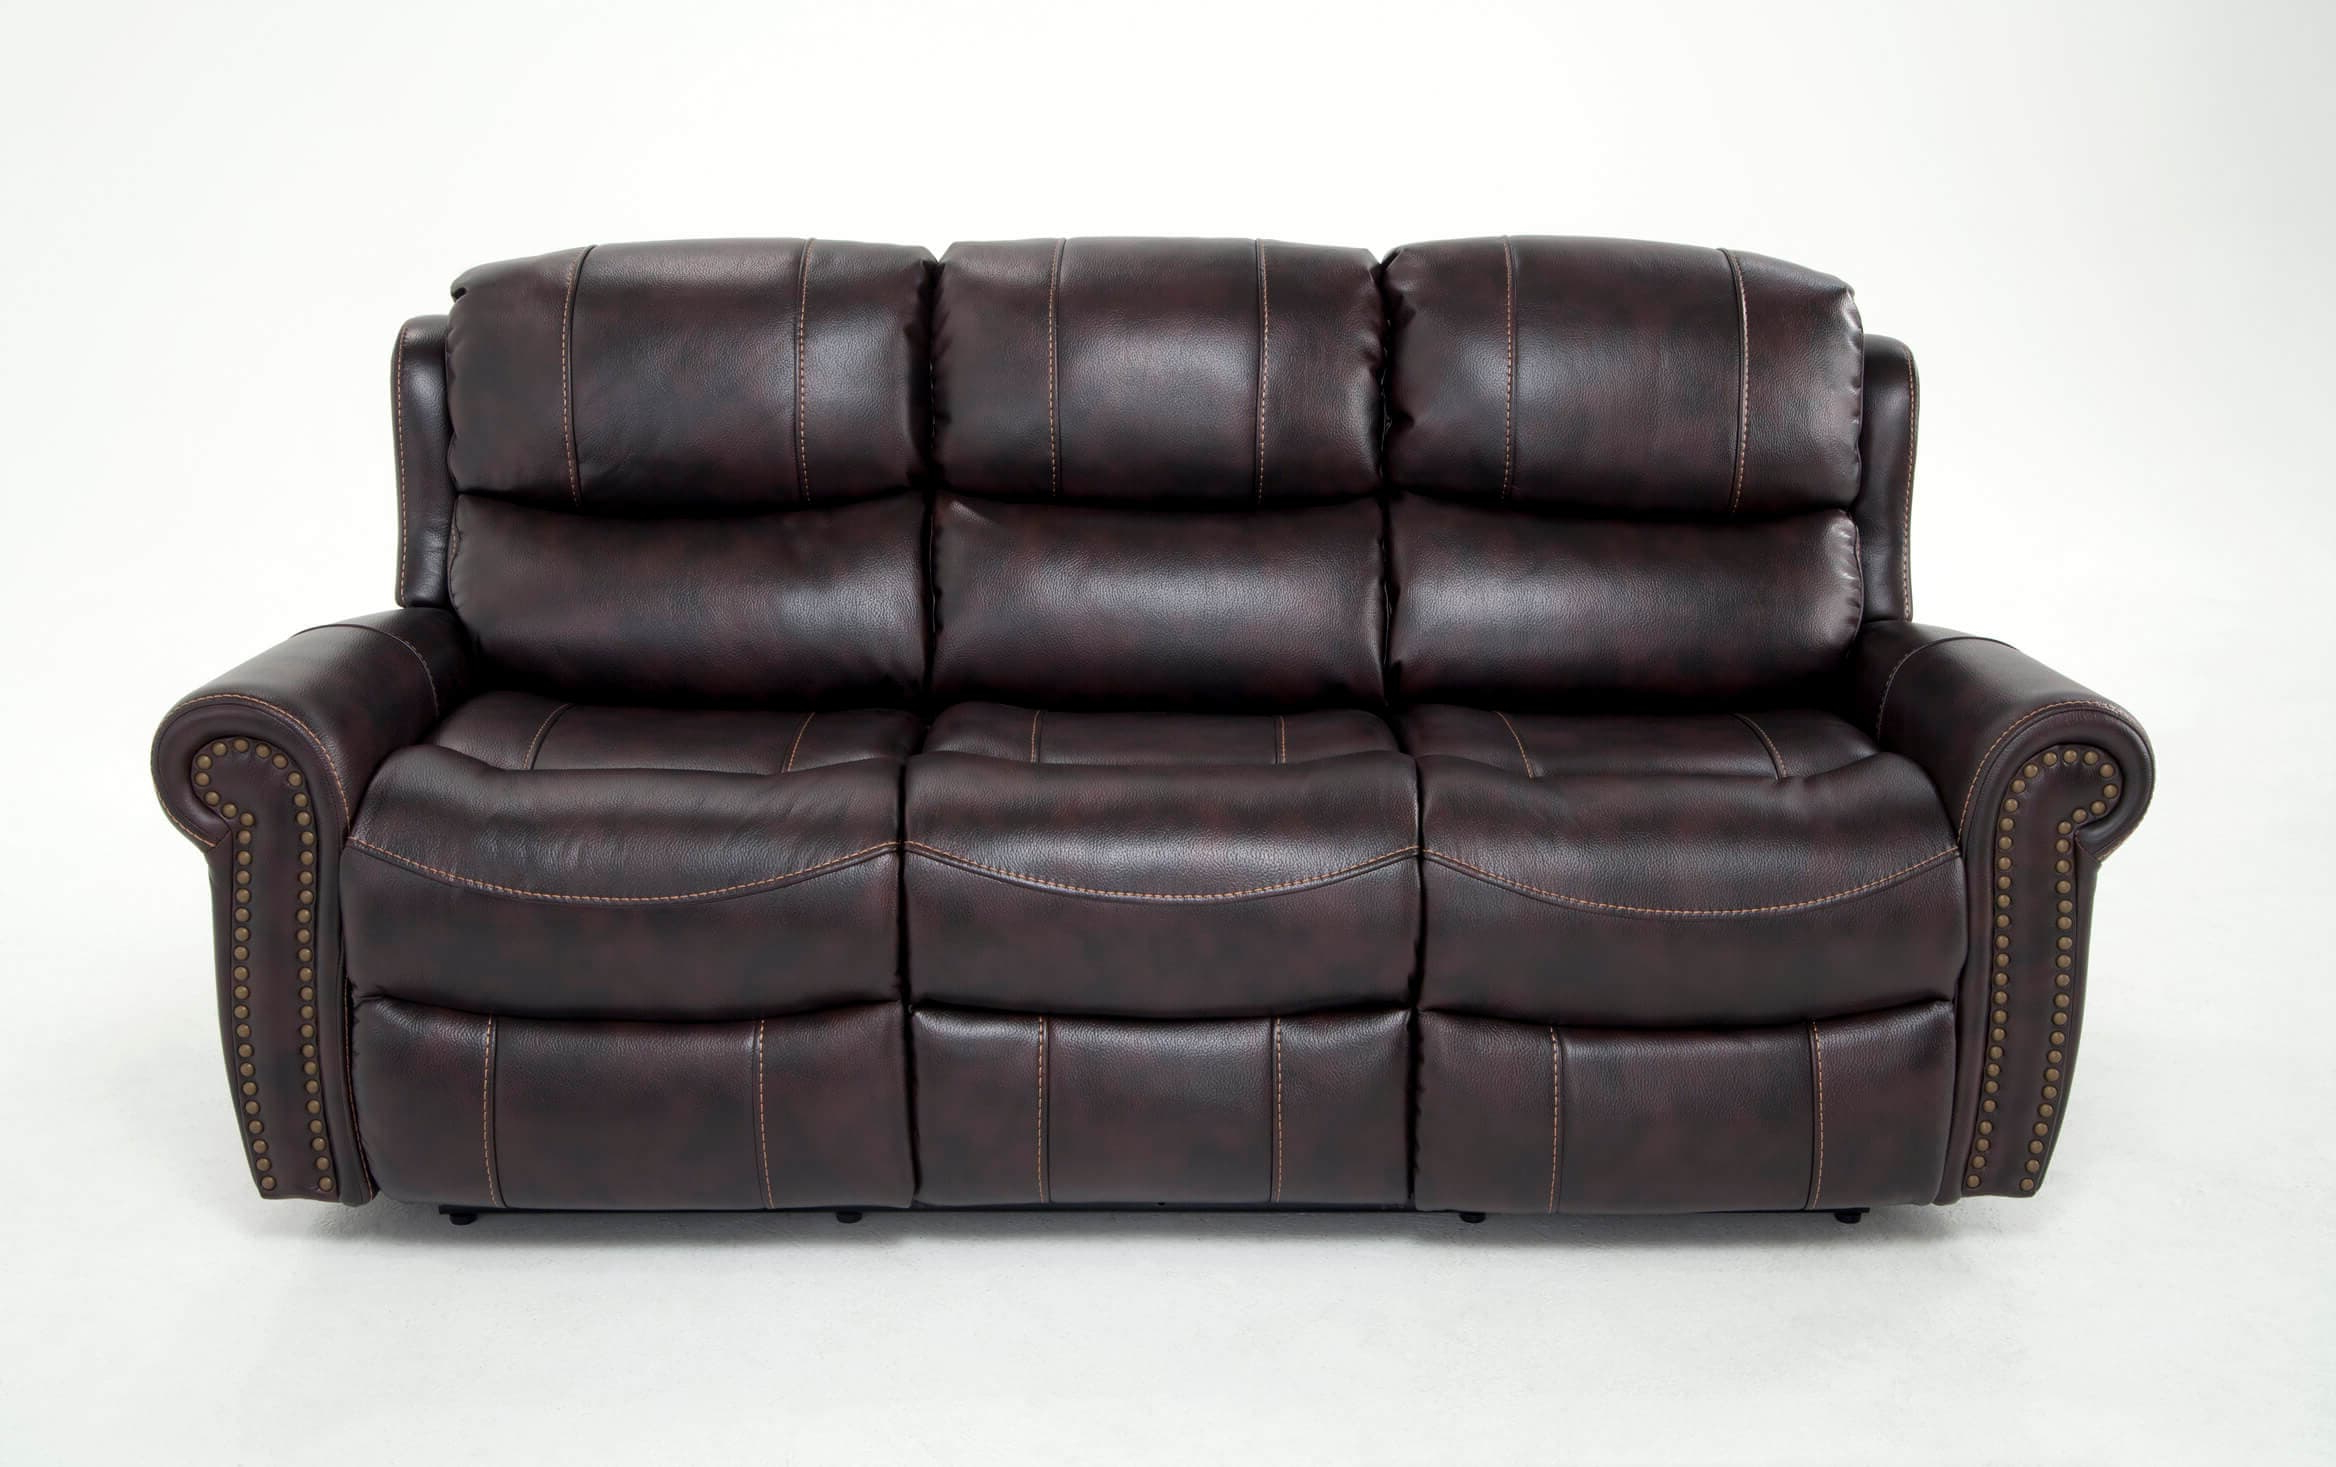 Bobs Furniture Leather Sofa : Trailblazer Gray Leather Pertaining To Most Recent Trailblazer Gray Leather Power Reclining Sofas (View 2 of 20)